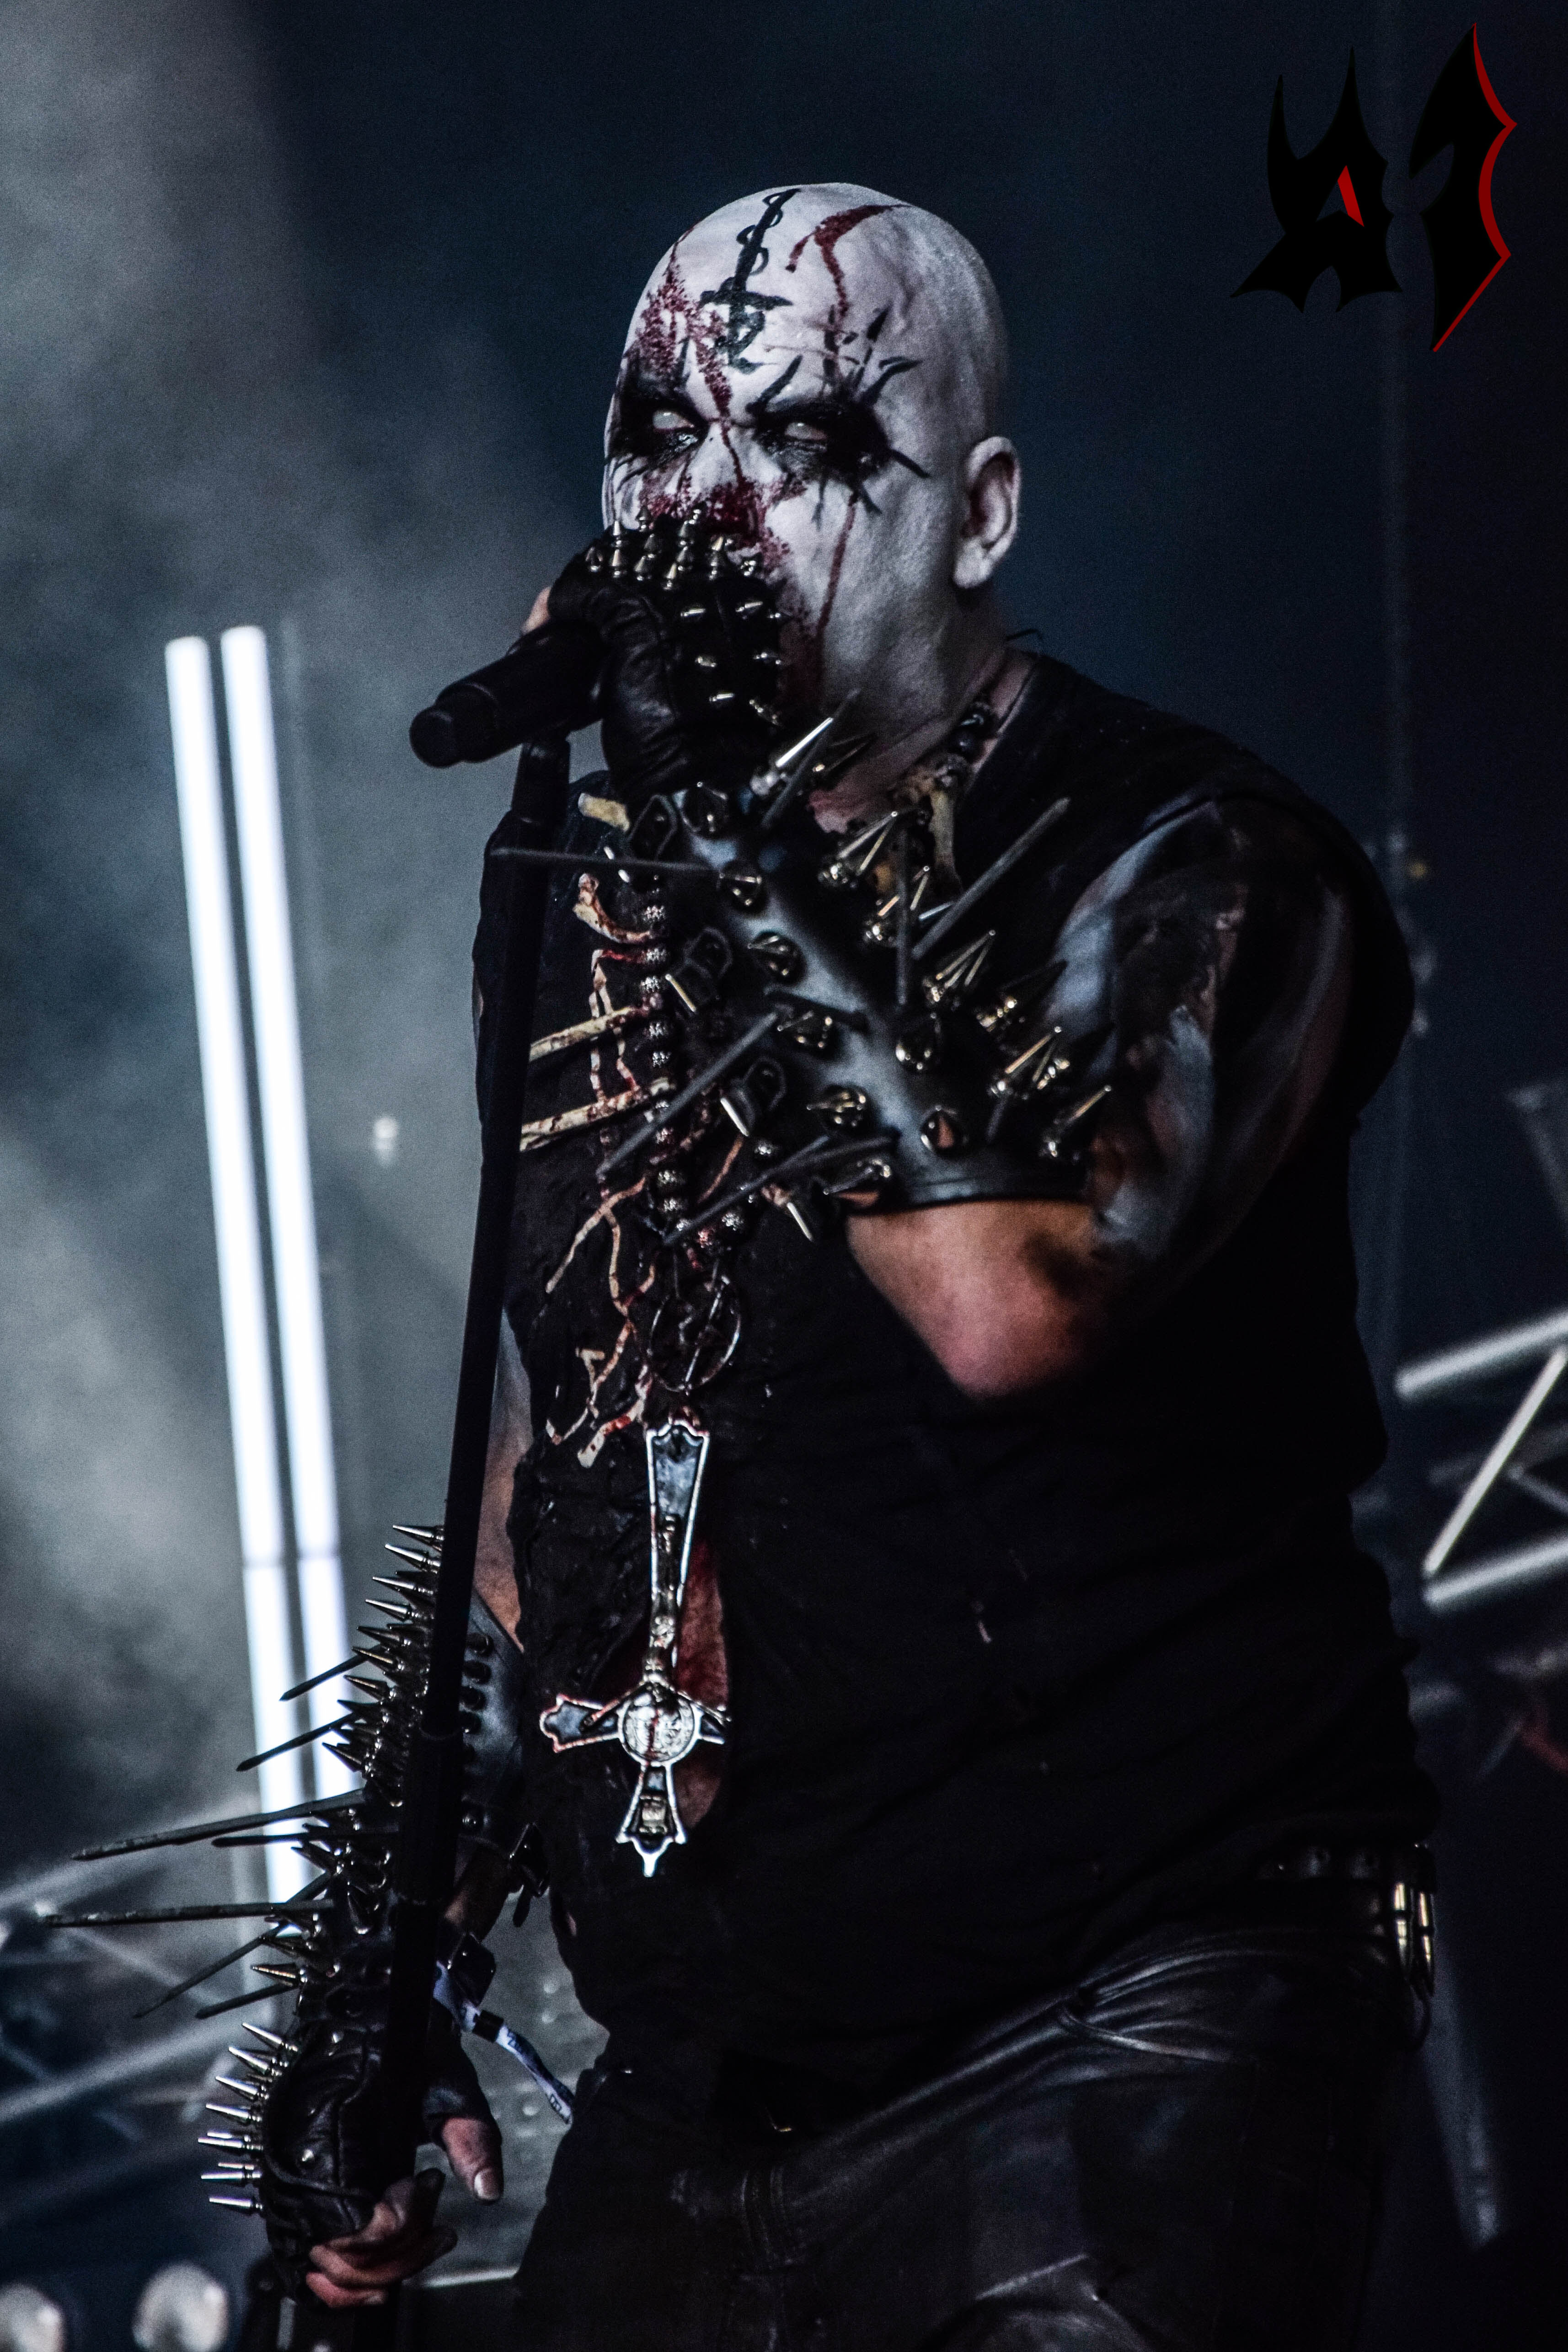 Hellfest - Day 1 - Nordjevel 3